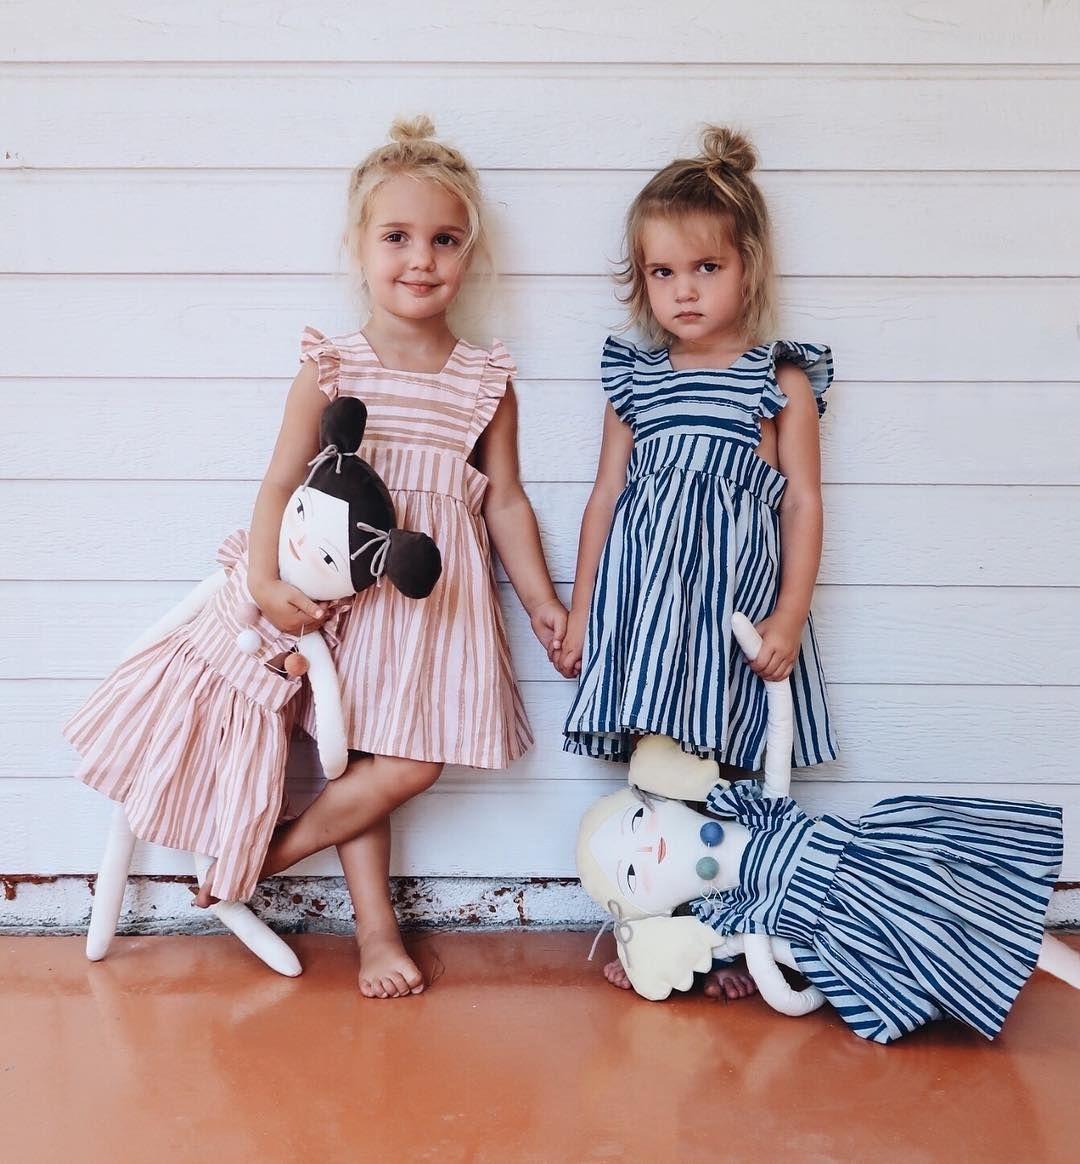 af156b921 kcstauffer twins with matching  merrileeliddiarshopdolls and ...